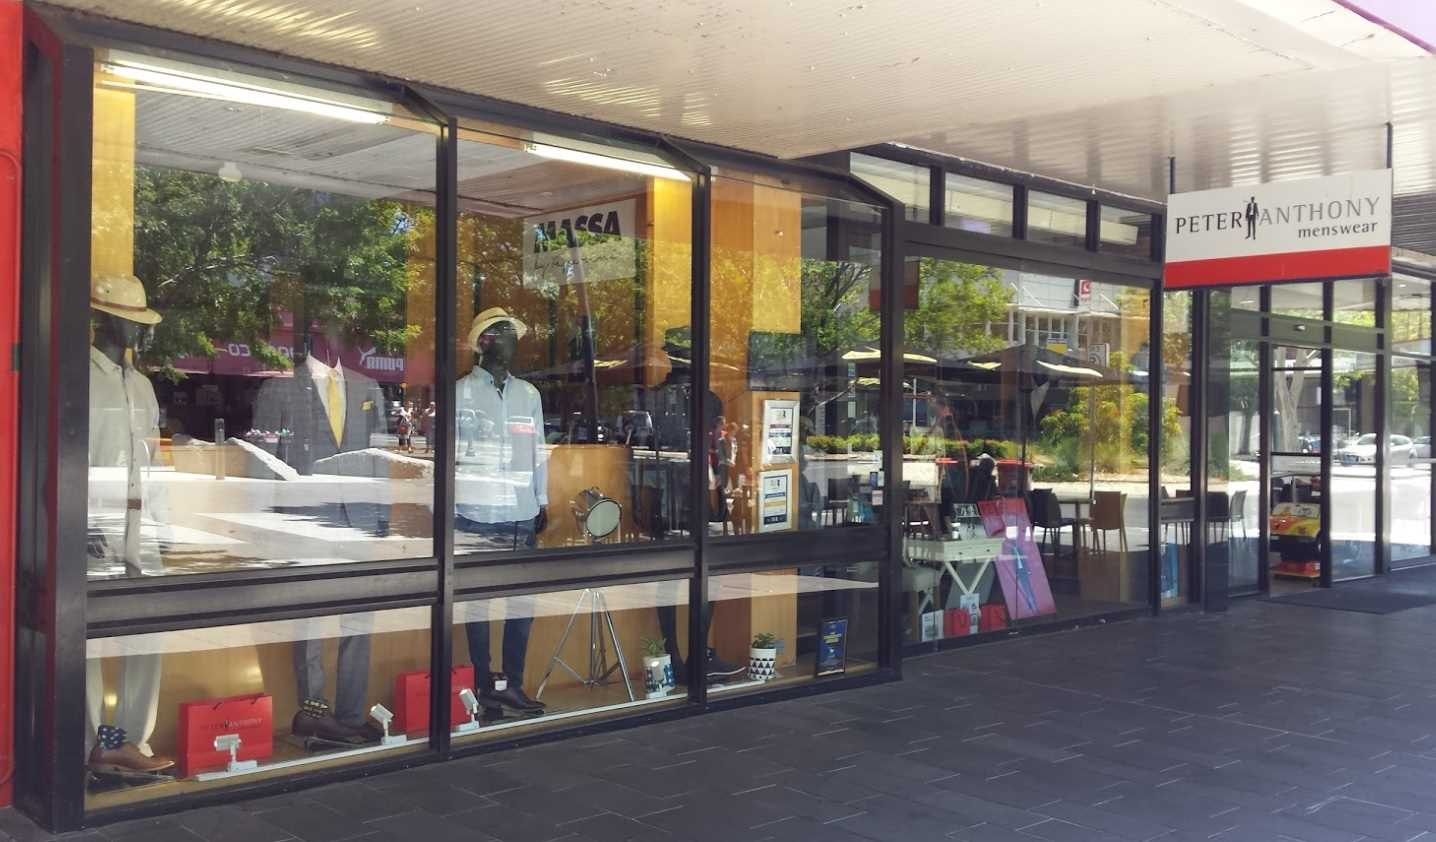 Iconic men's fashion store